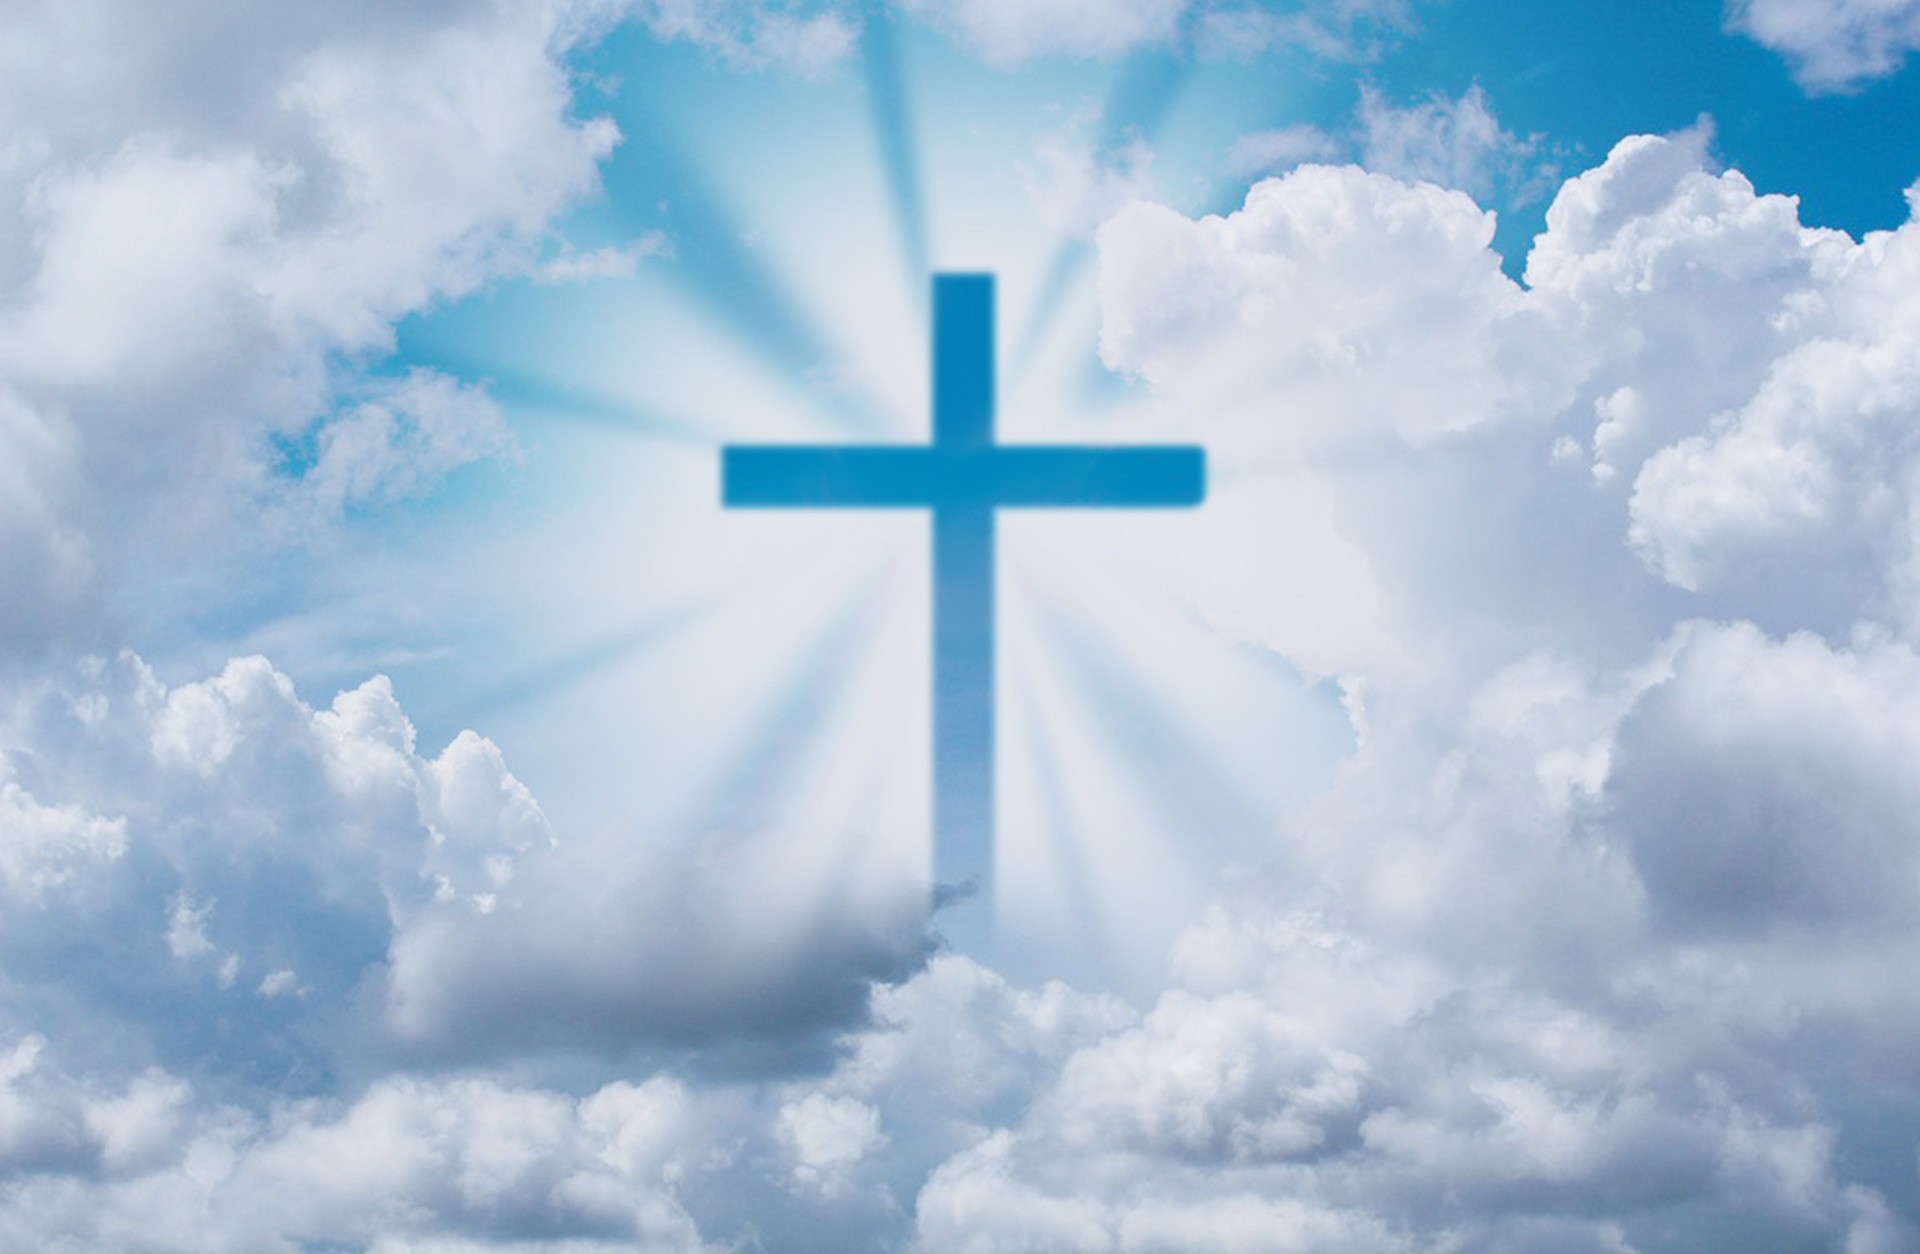 Просите Бога о невозможном